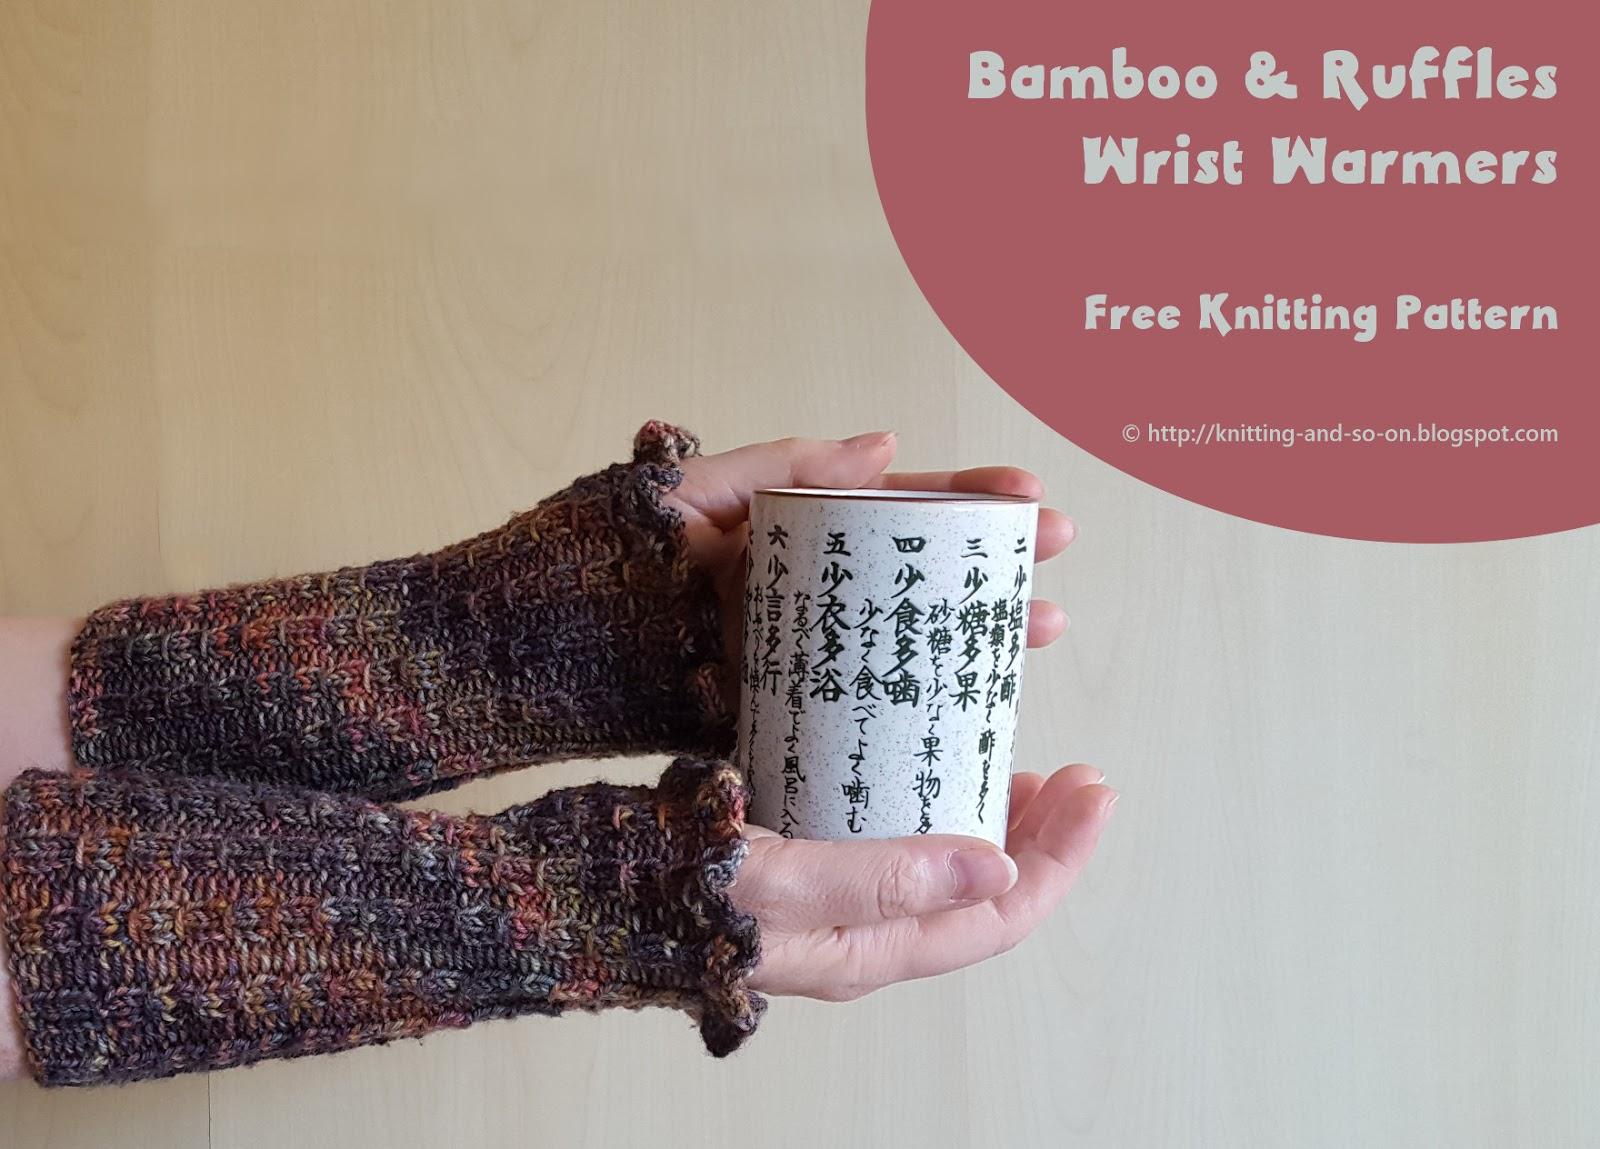 Knitting and so on: Bamboo & Ruffles Wrist Warmers